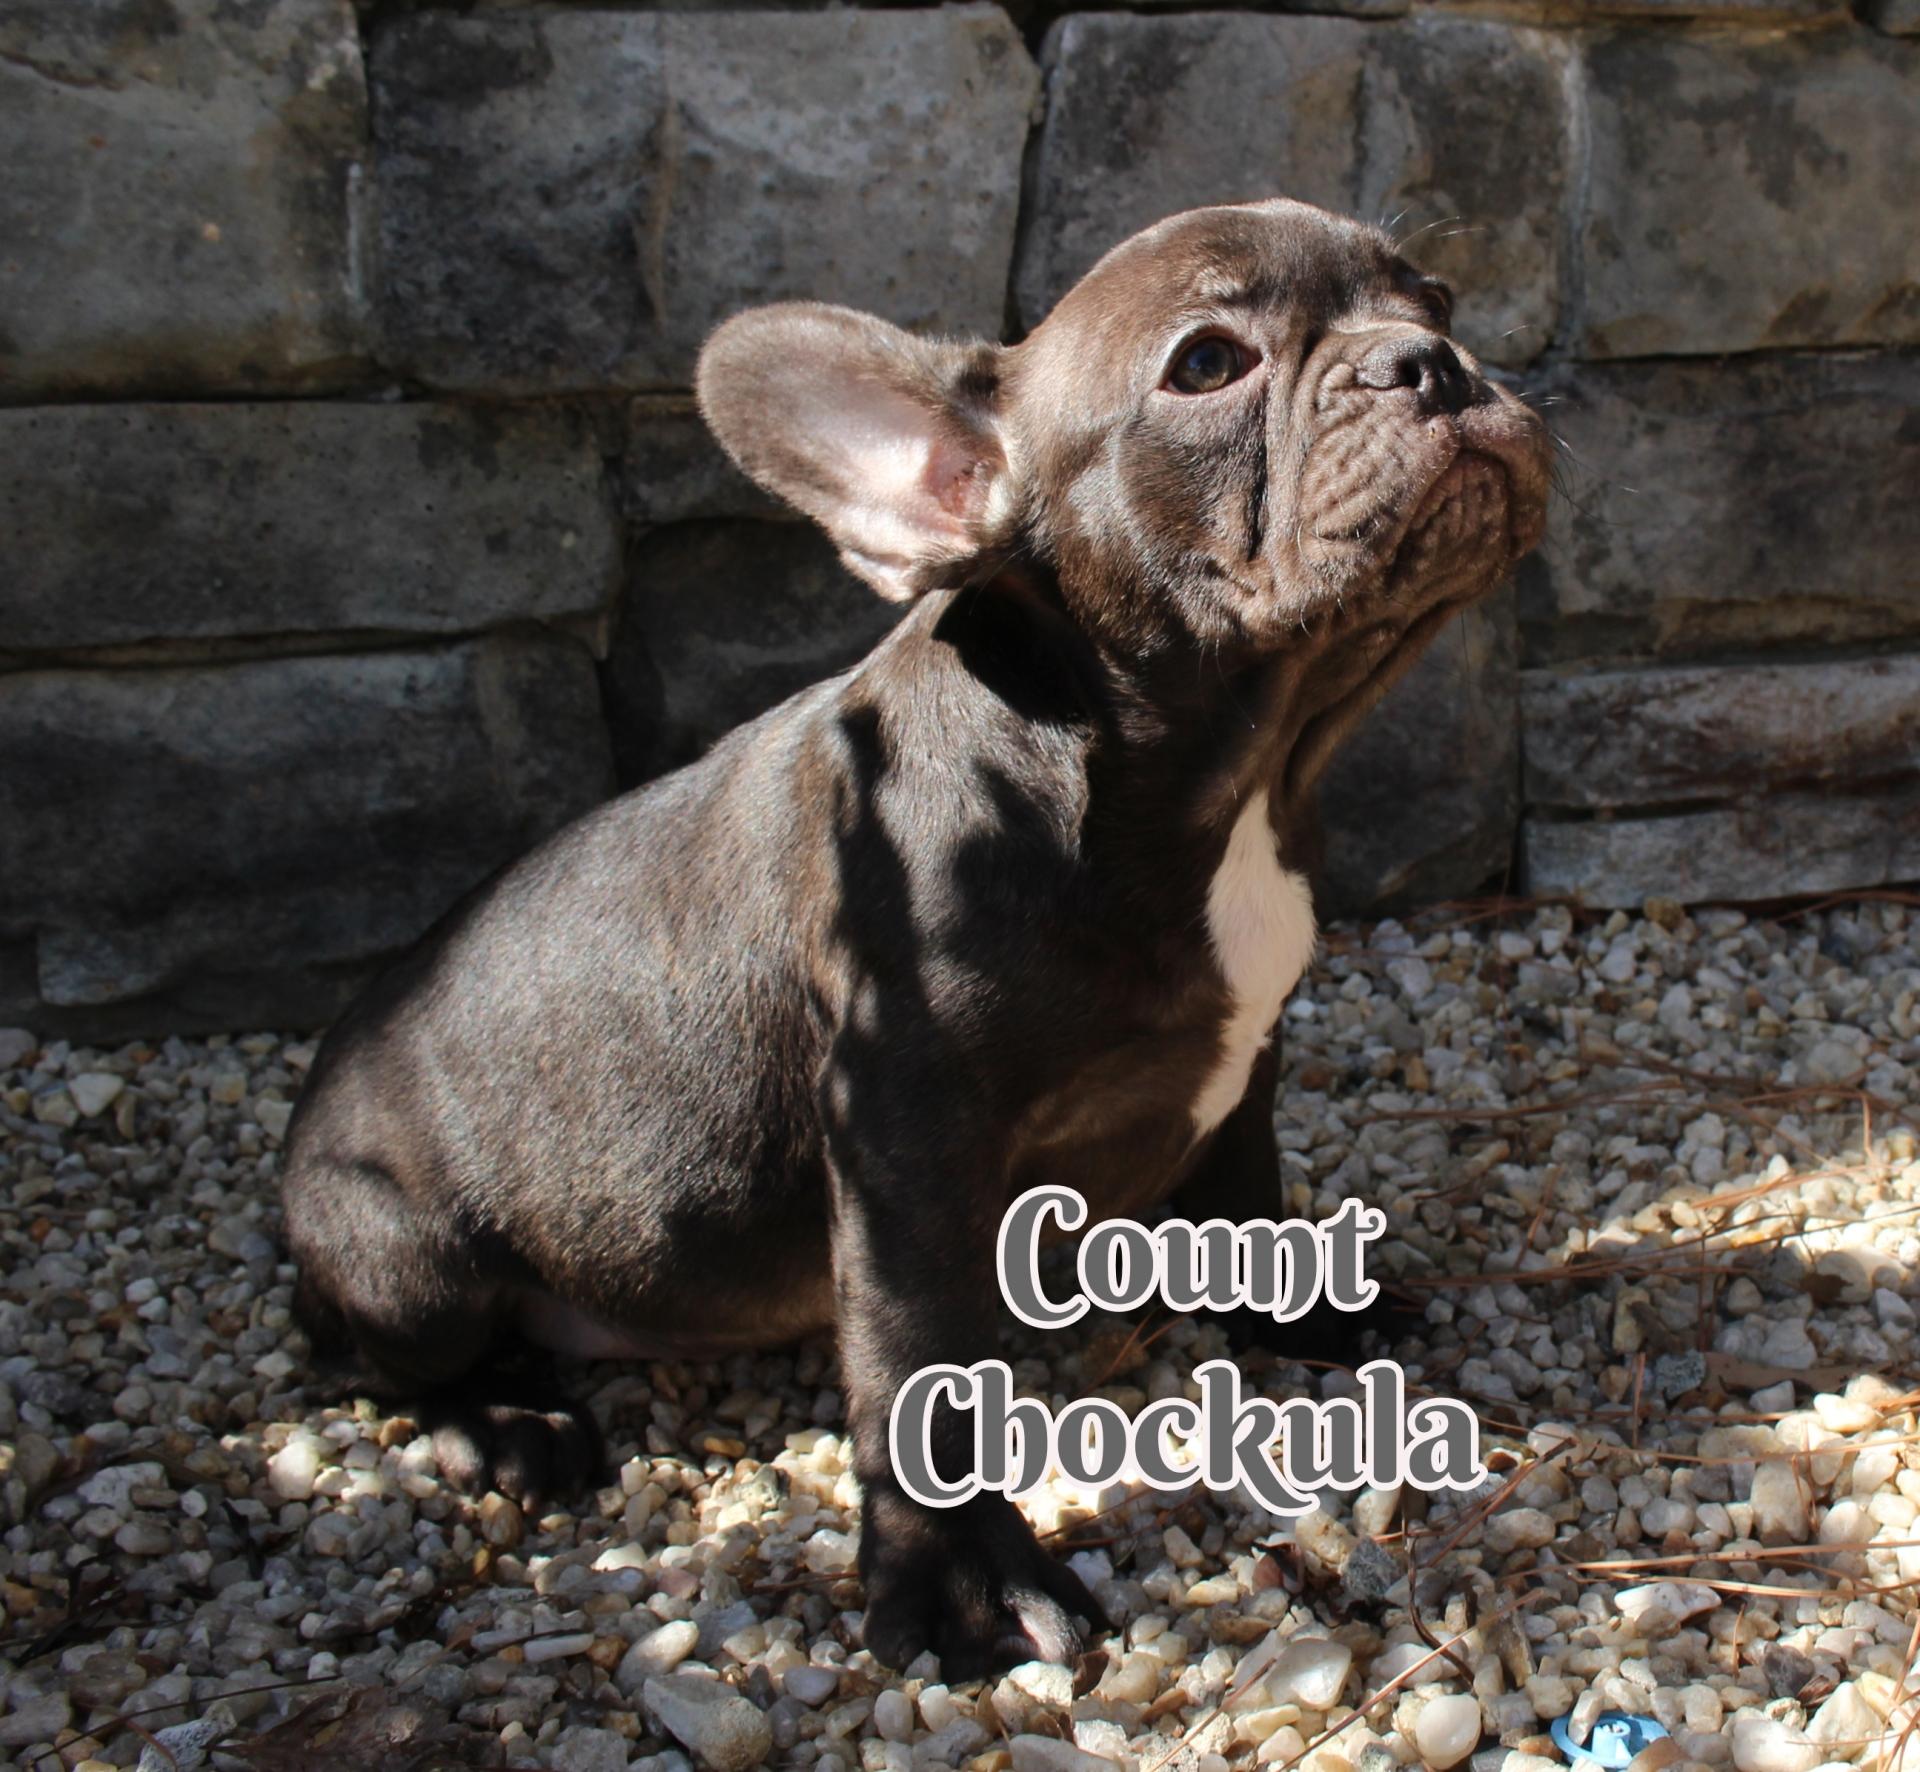 #FrenchBulldogPuppies #MerleFrenchBulldog #Frenchie #AvailablePuppies #AKCRegFrenchBulldog #SouthernTerritoryFrenchies #CountChockula